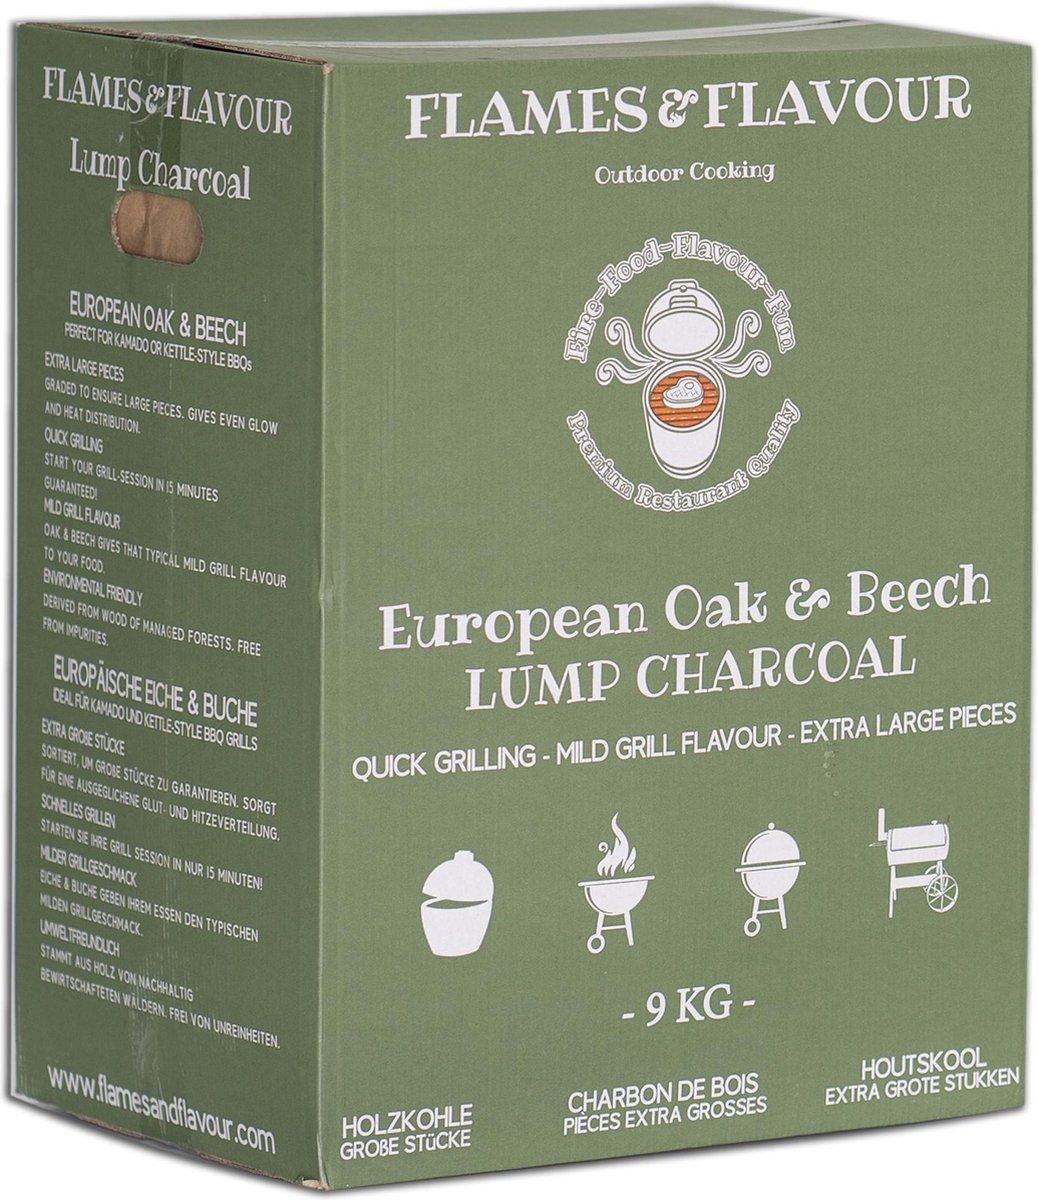 Europees Eiken & Beuken Houtskool 9 KG van Flames & Flavour voor Big Green Egg - Kamado - Kettle BBQ